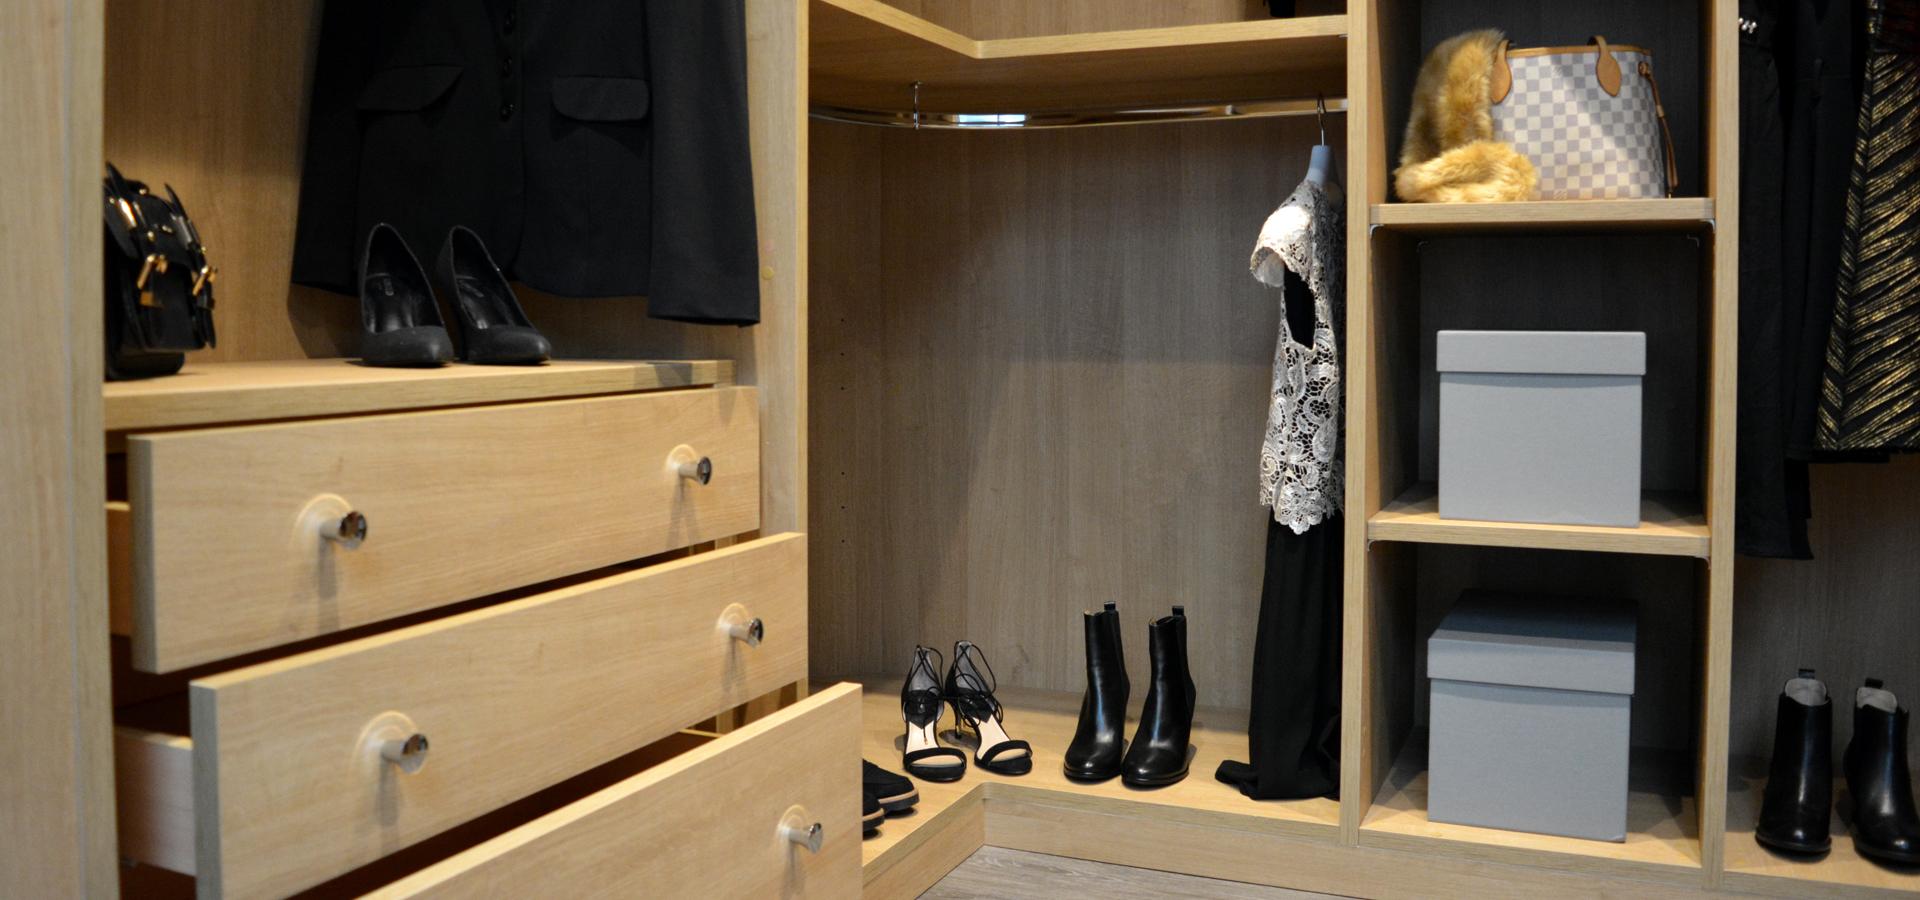 Quintessentially British trojan Oak Walk in wardrobe